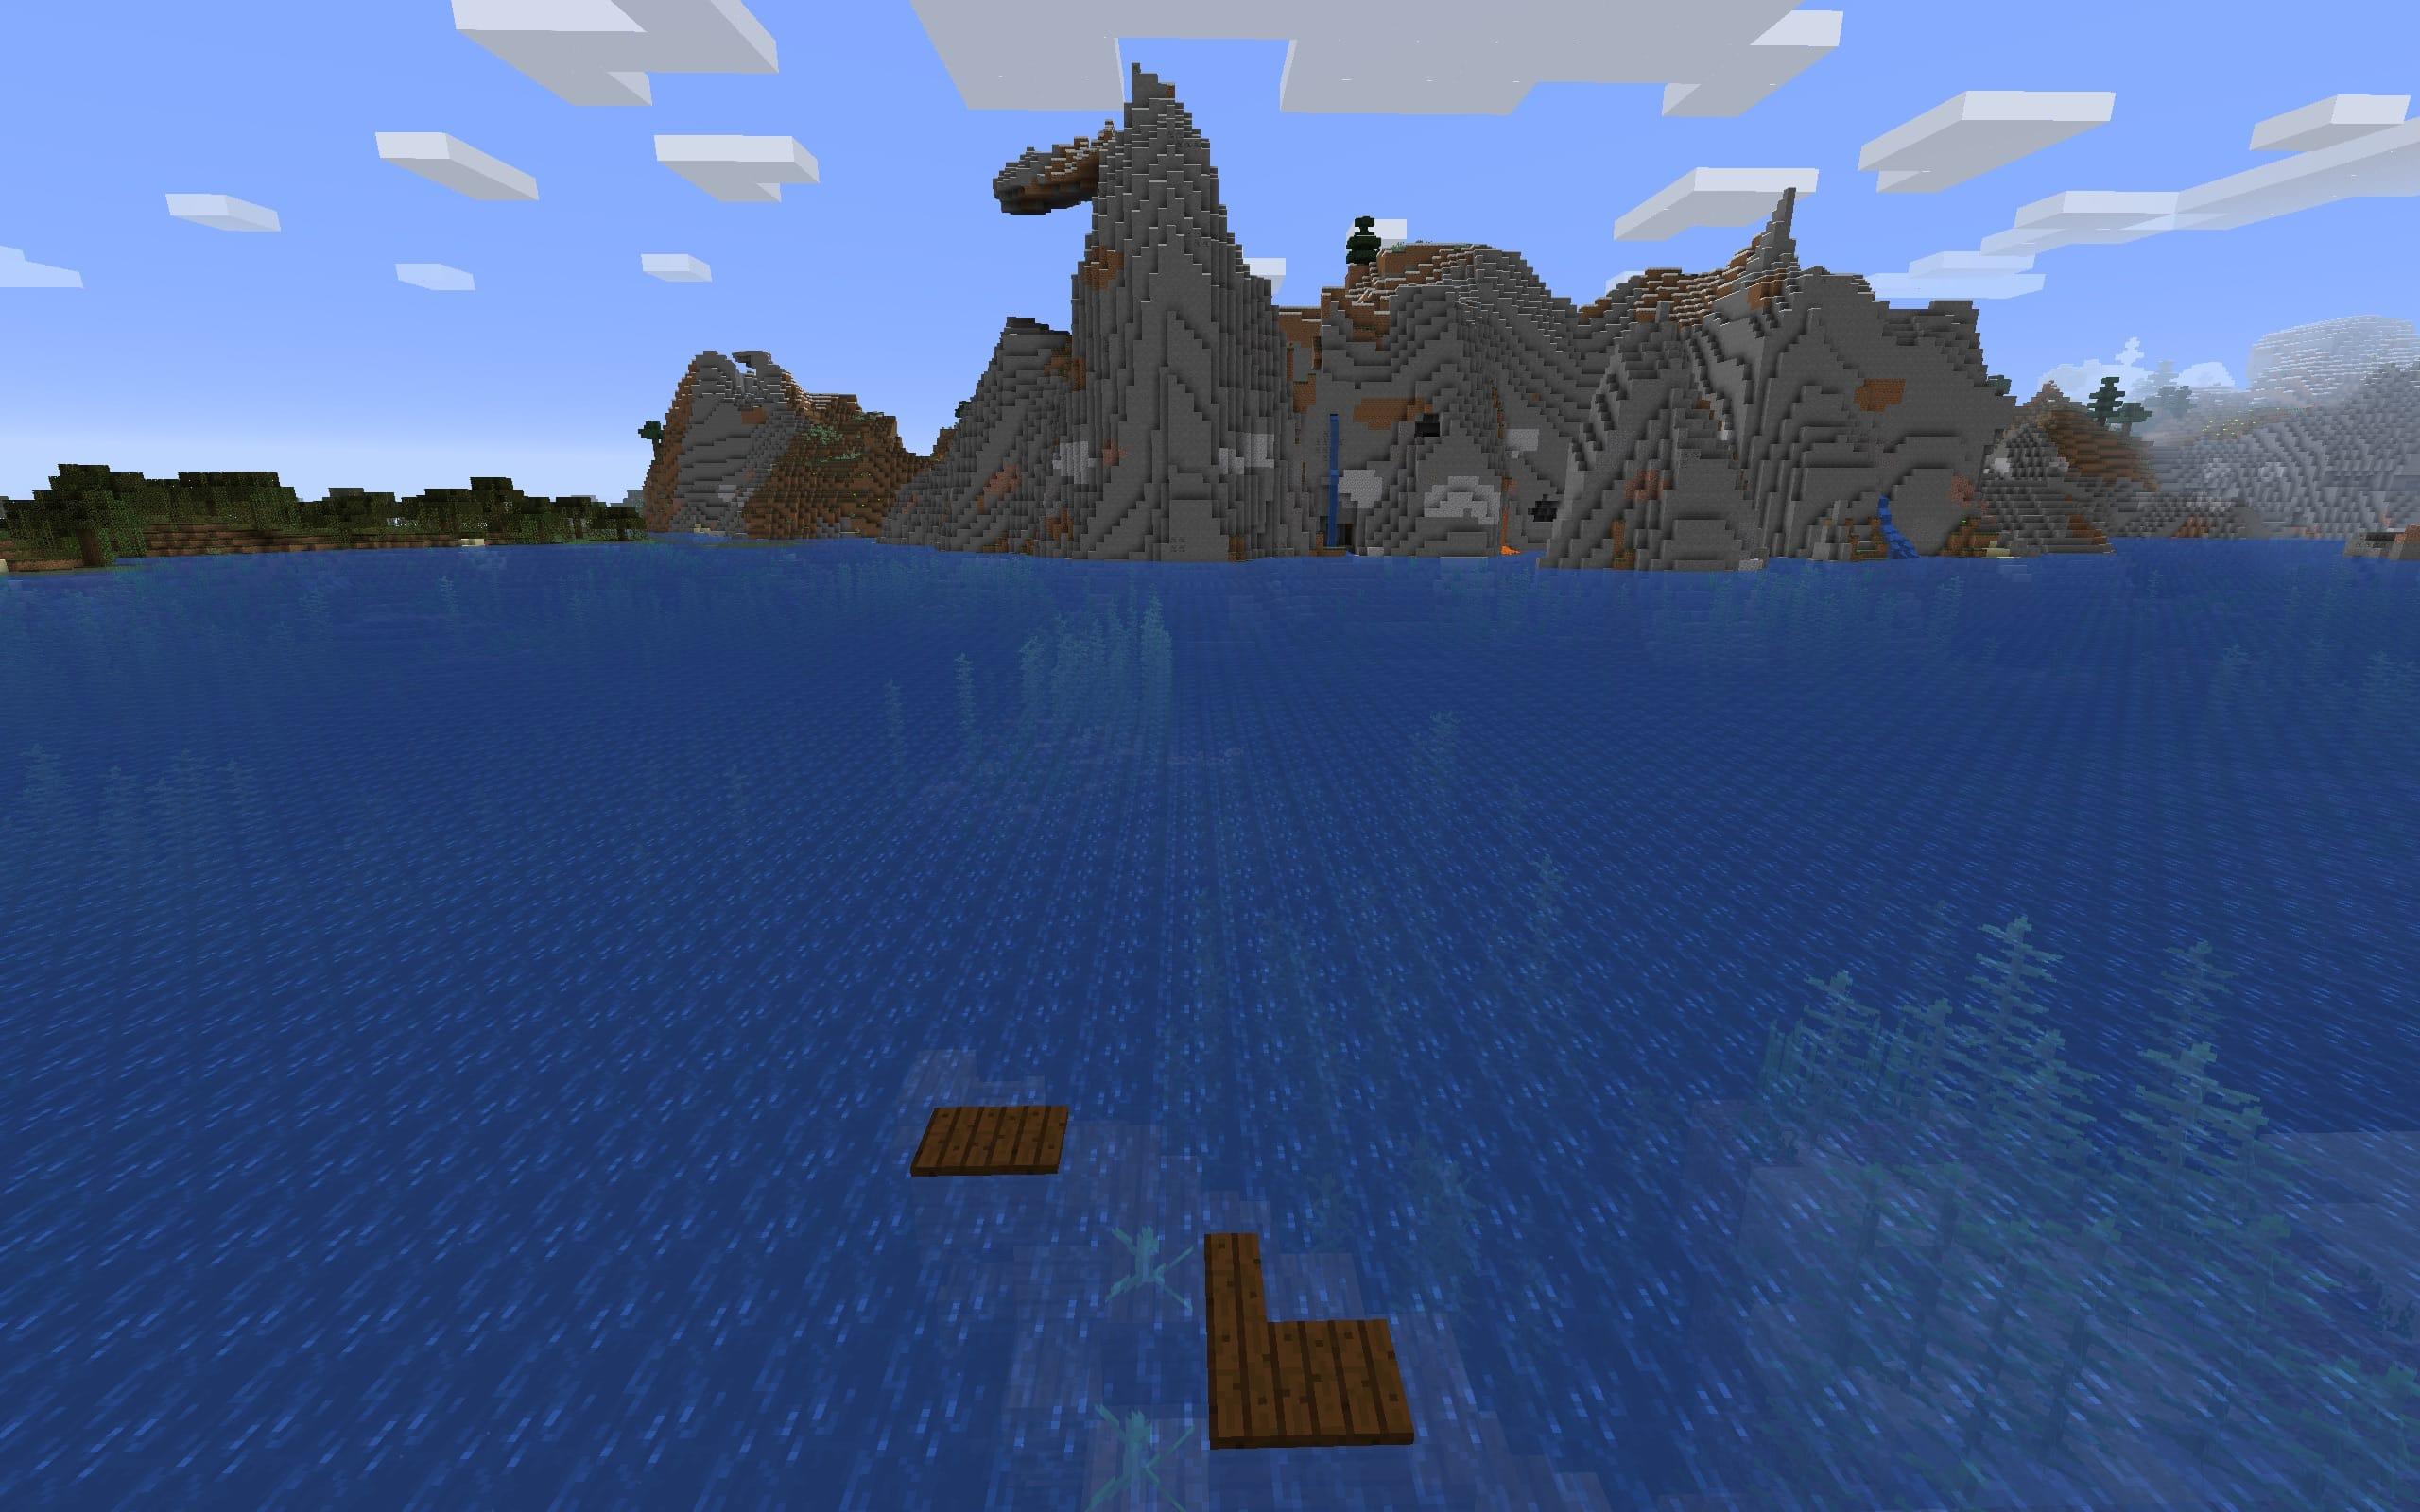 Minecraft Shipwreck Seed